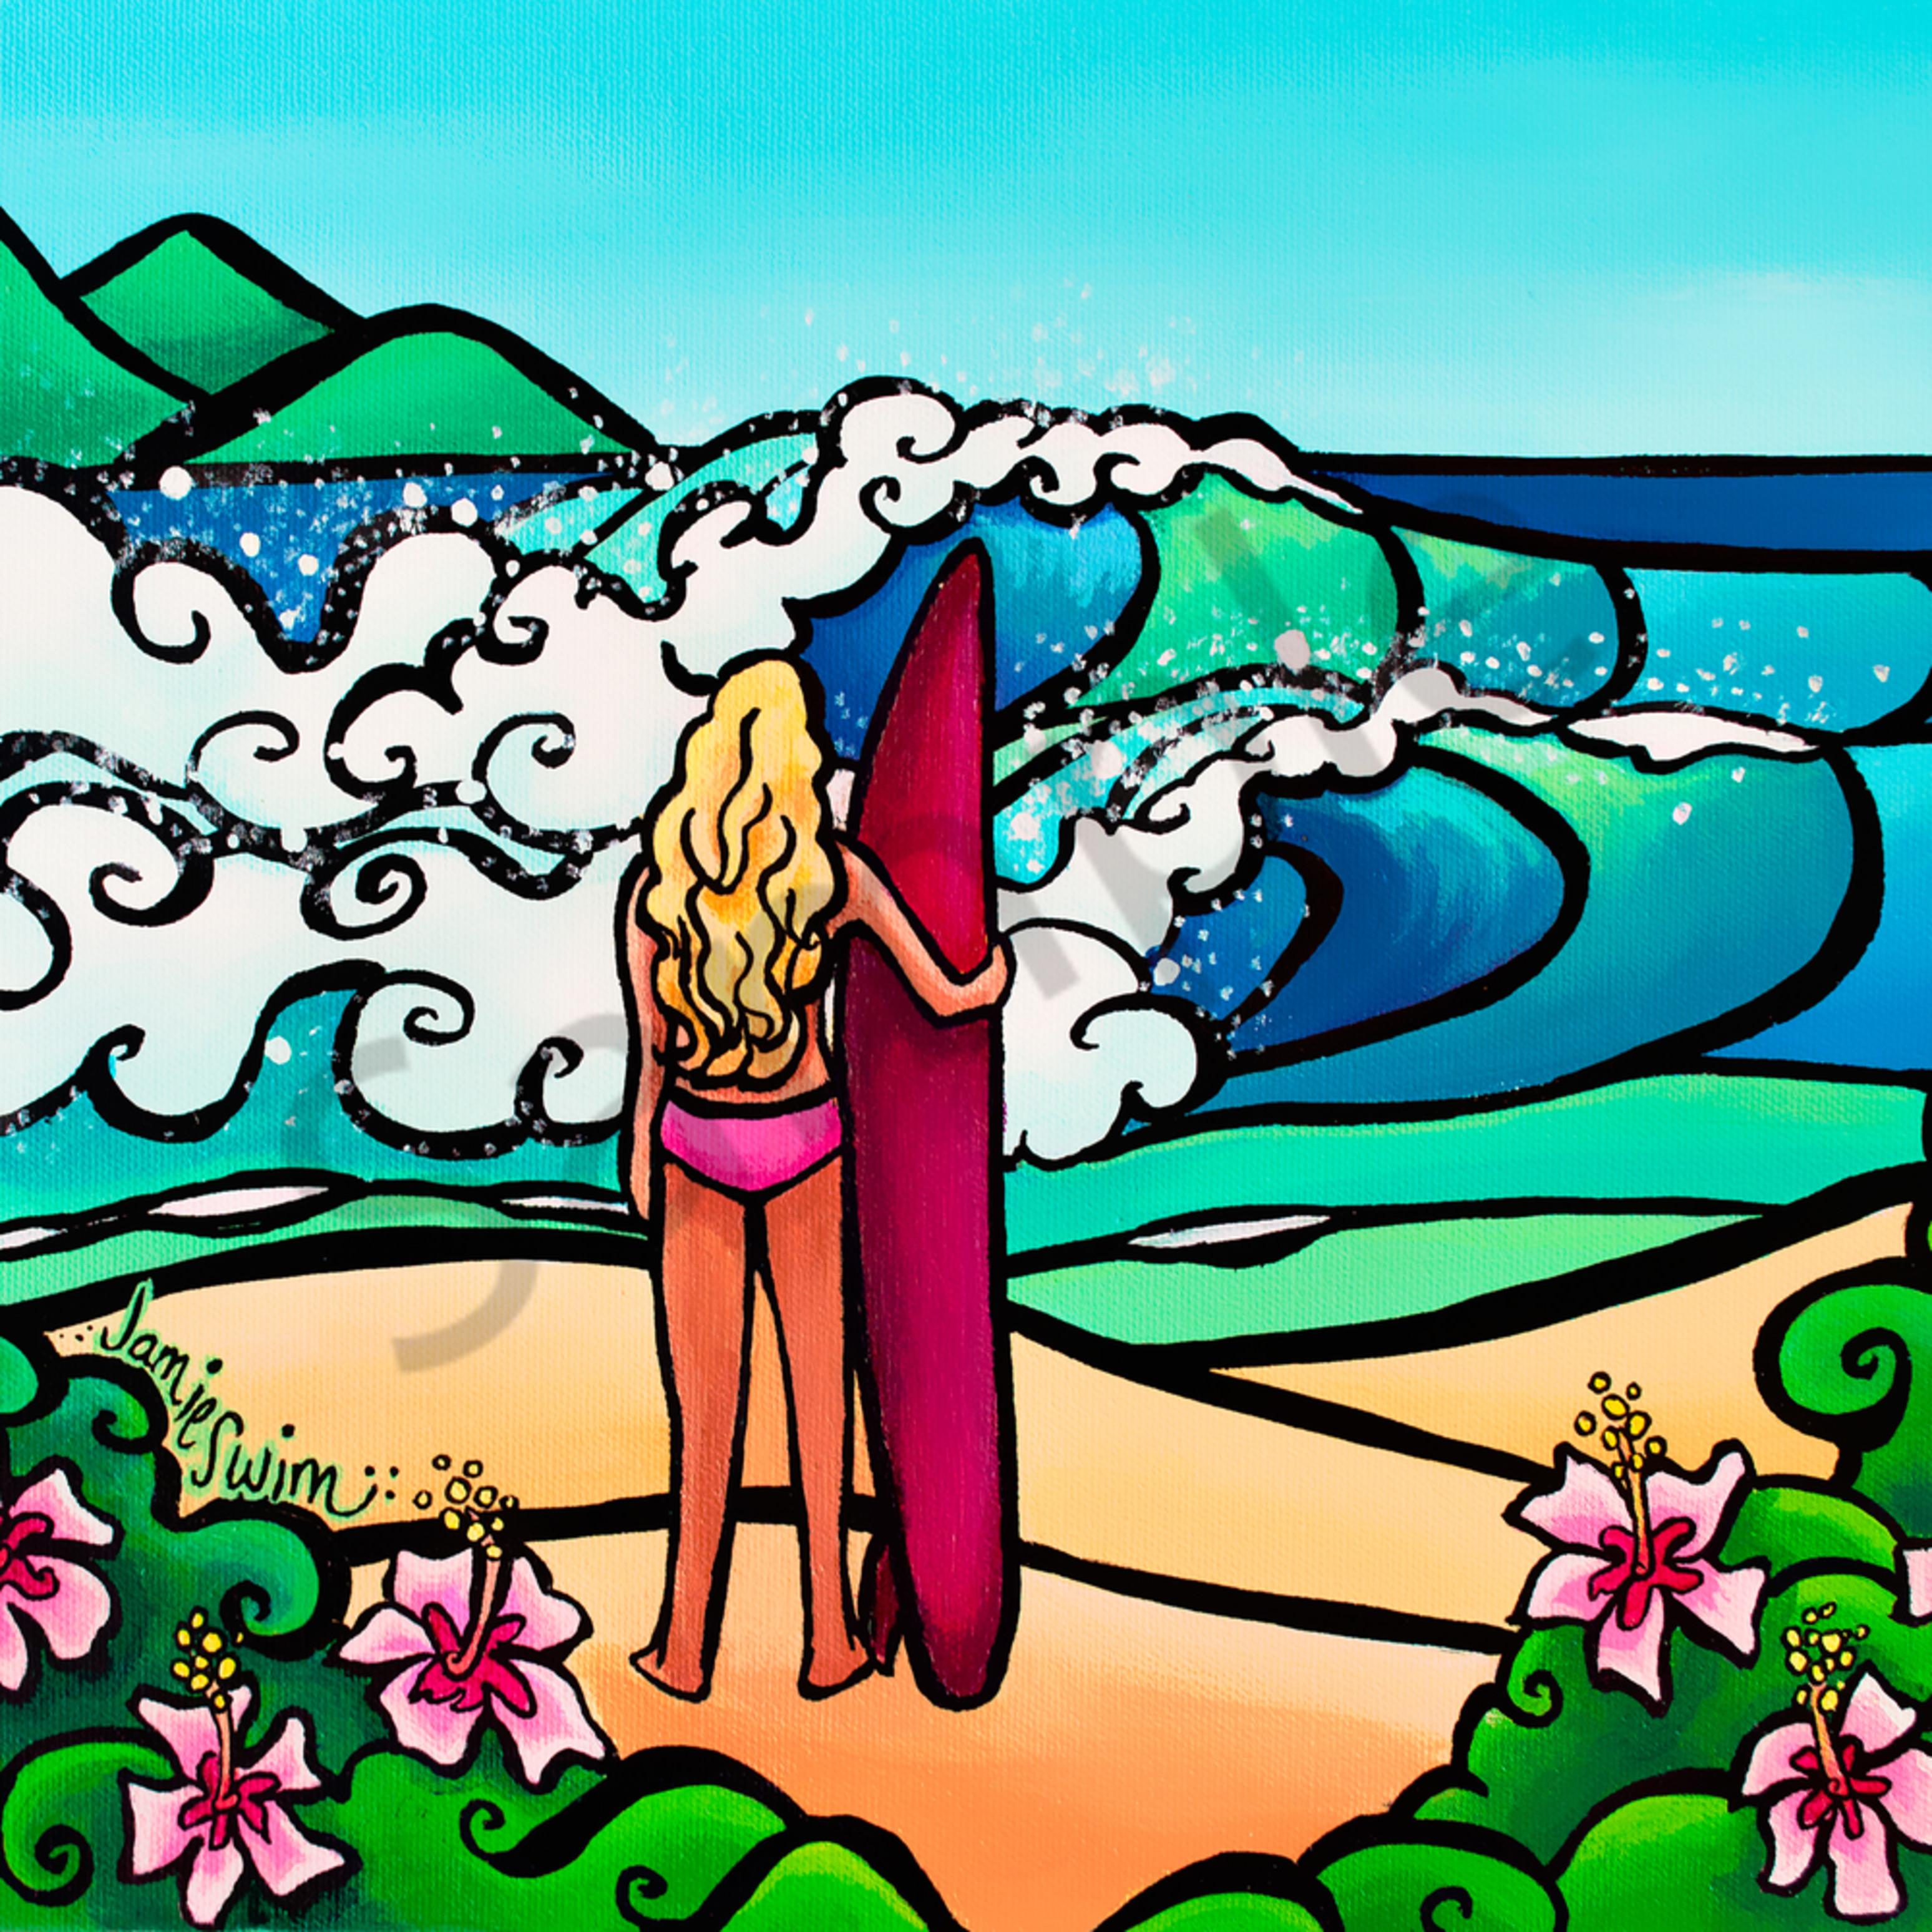 Ai swim surfergirl hoimsl